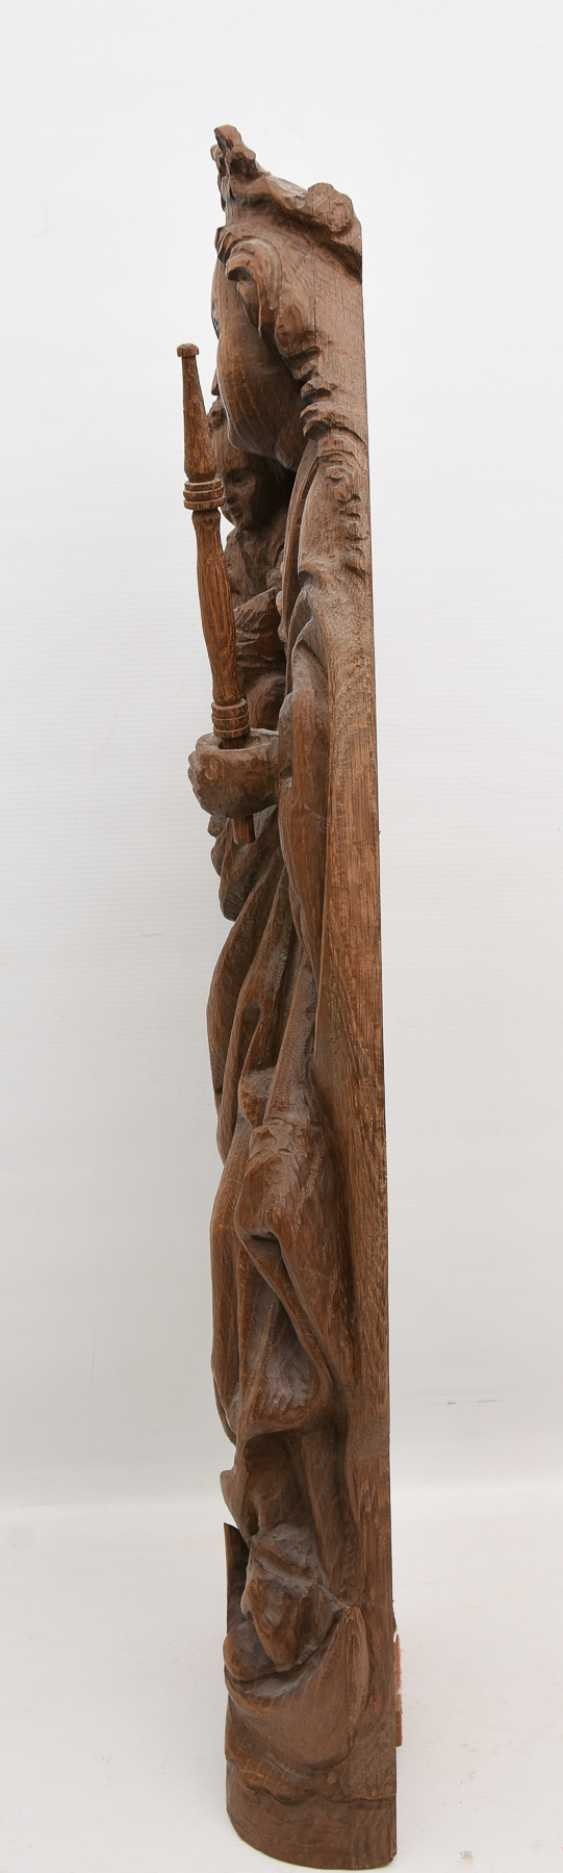 OSNABRÜCK MADONNA, copy after the Original, beschnitztes wood, antique stained, Oberammergau, 20. Century - photo 4